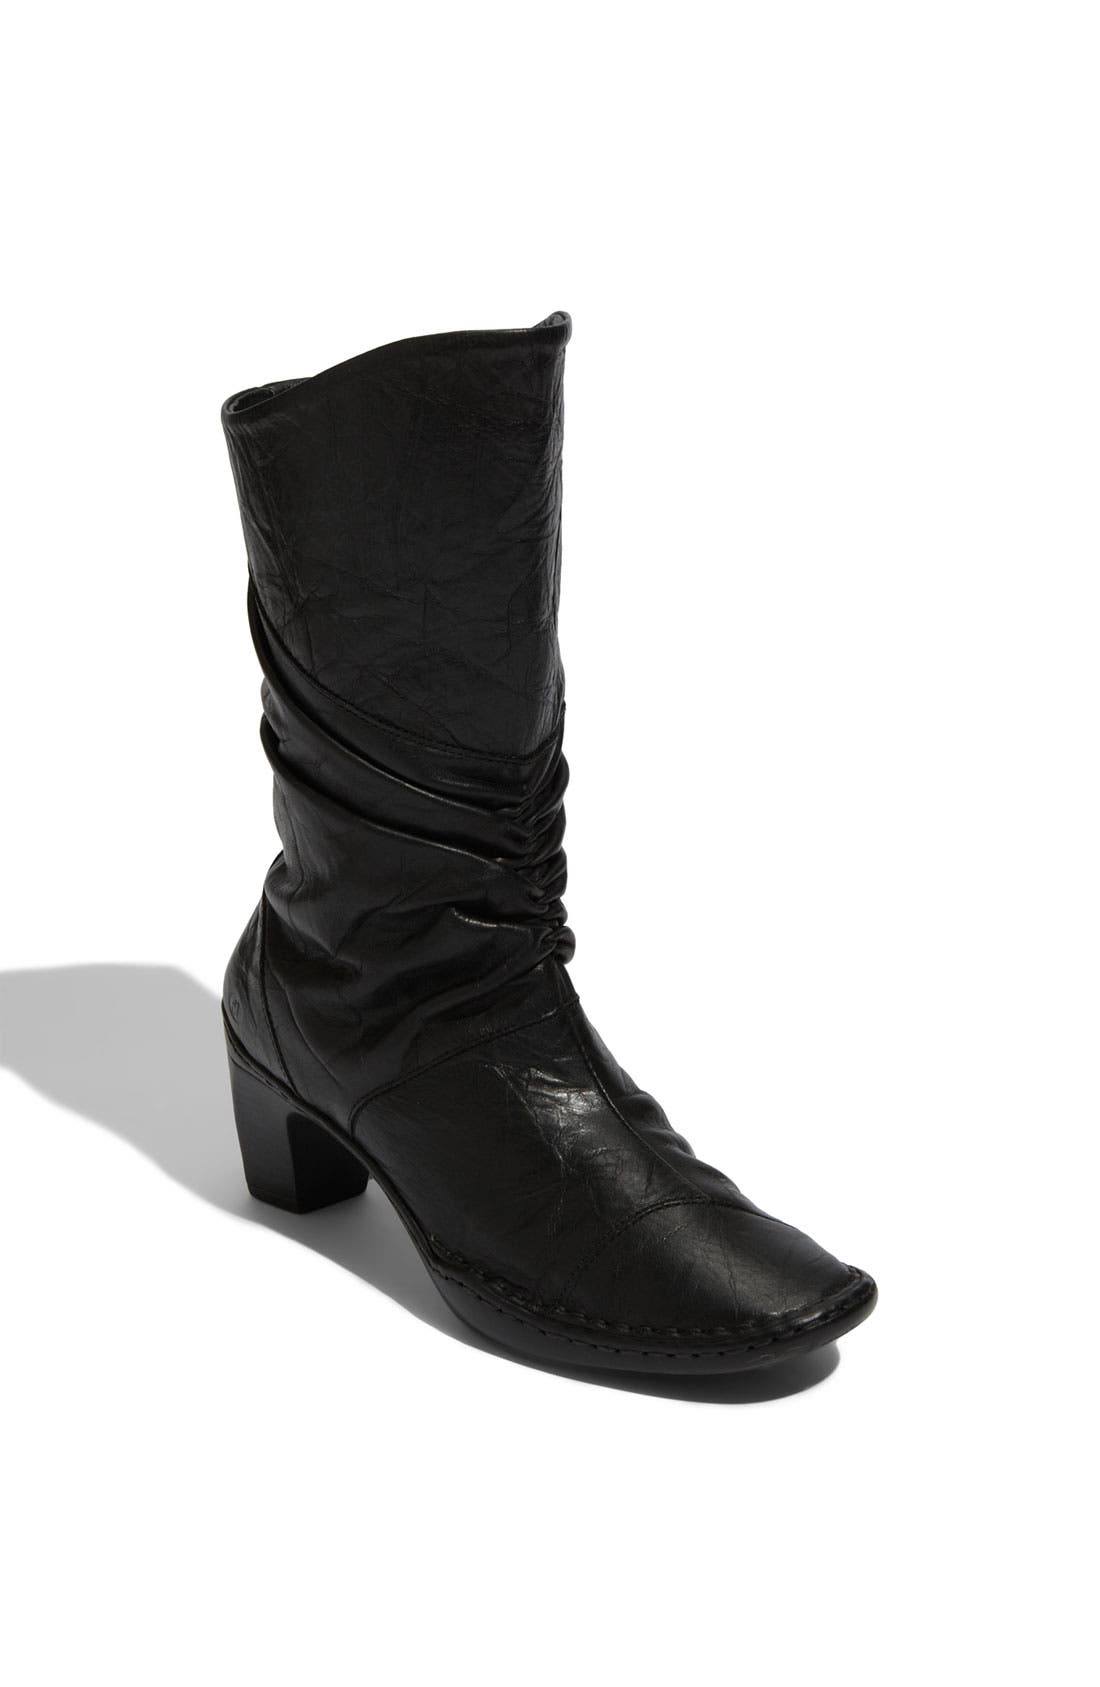 Alternate Image 1 Selected - Josef Seibel 'Calla 05' Boot